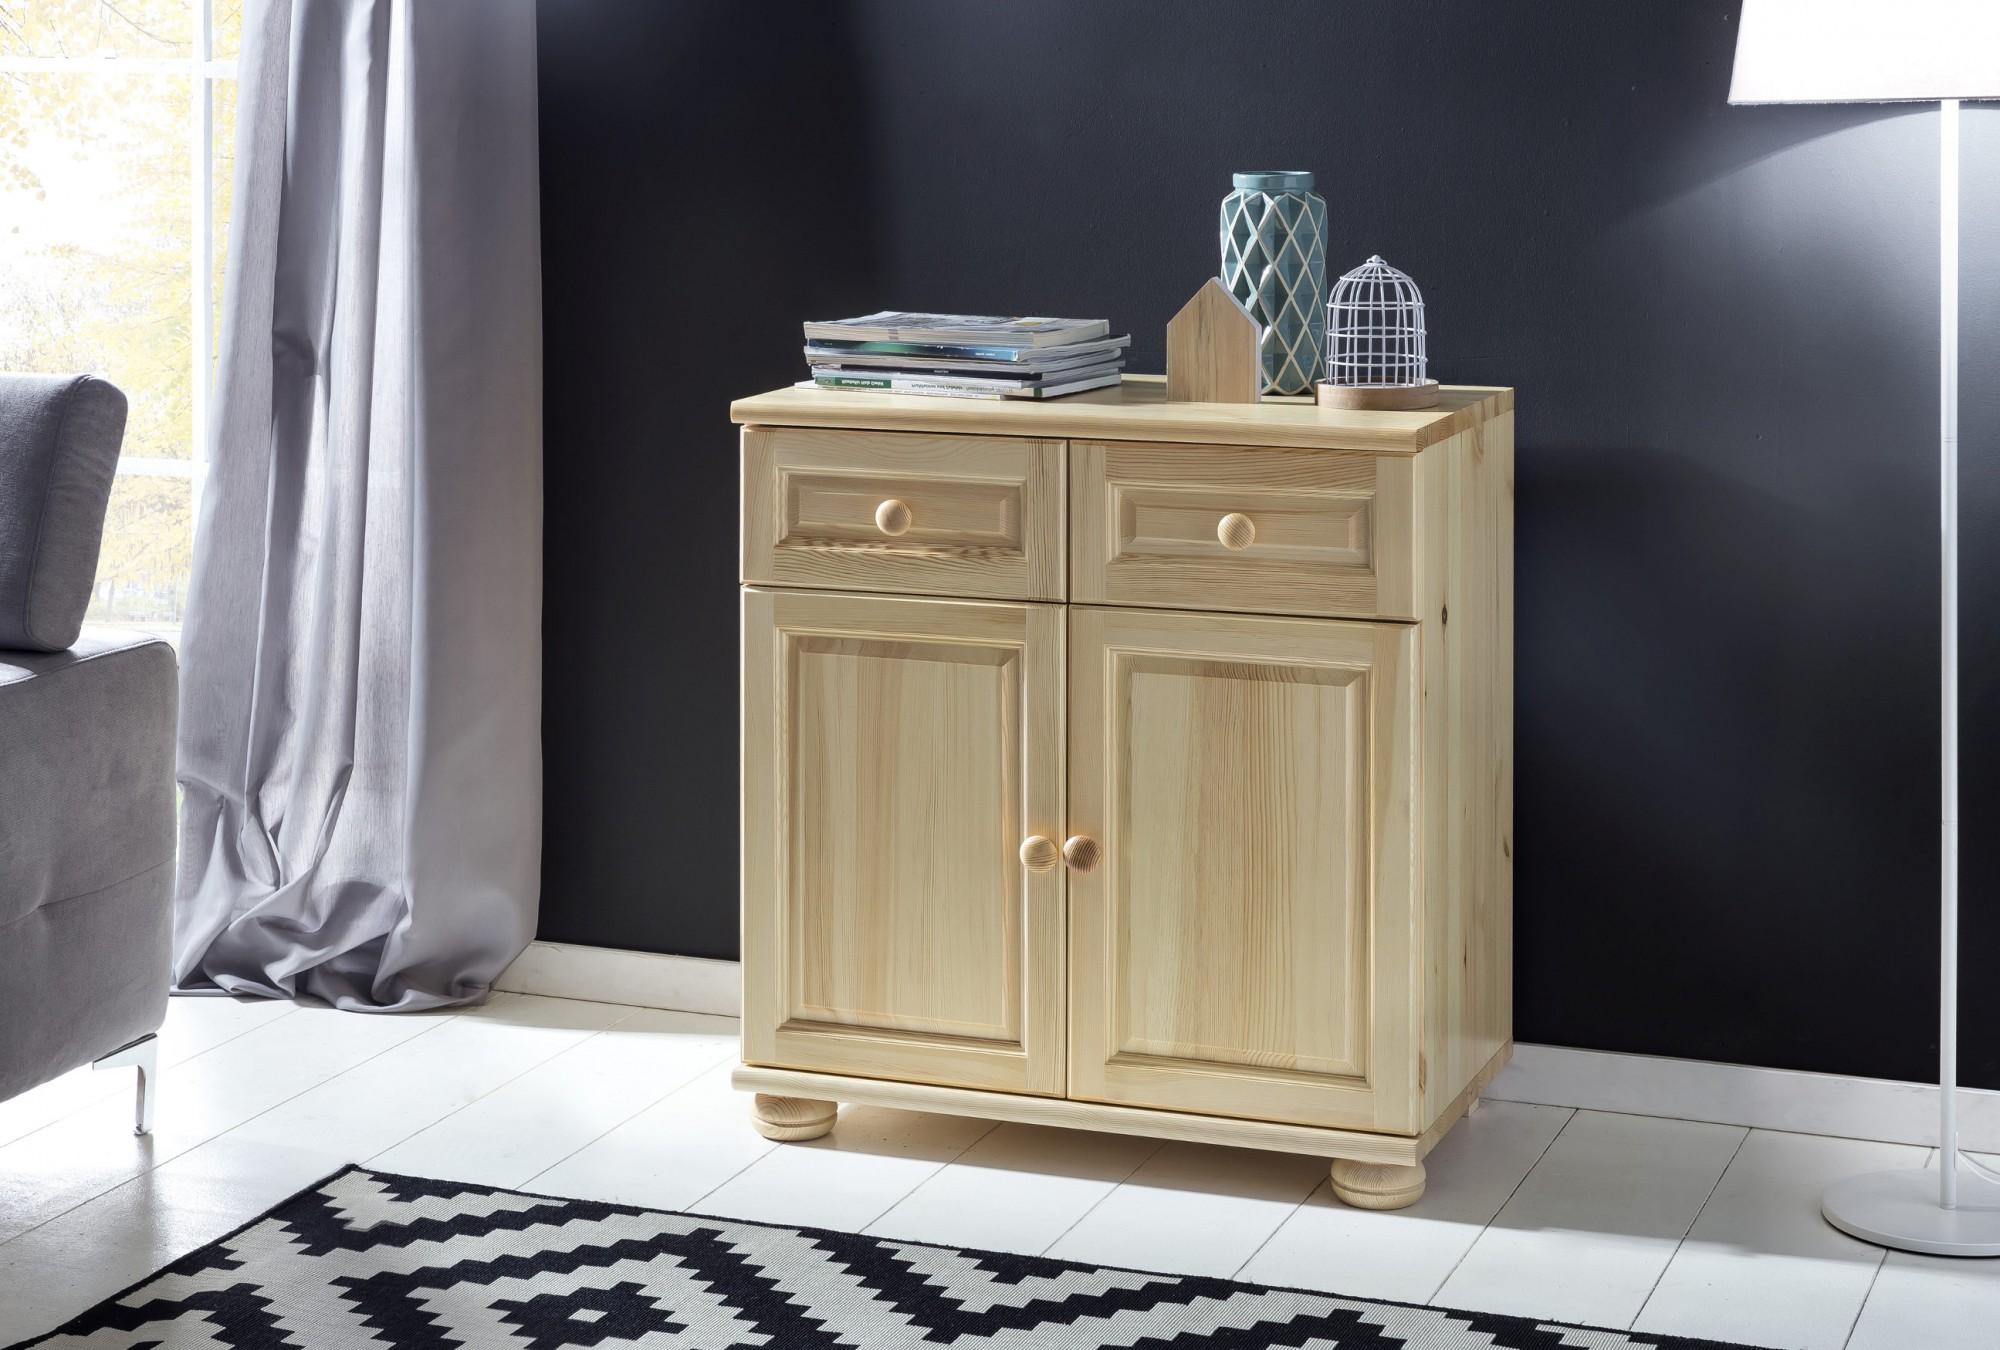 kommode vienna highboard schrank 2 t ren 2 schubladen 80 cm massivholz kiefer ebay. Black Bedroom Furniture Sets. Home Design Ideas